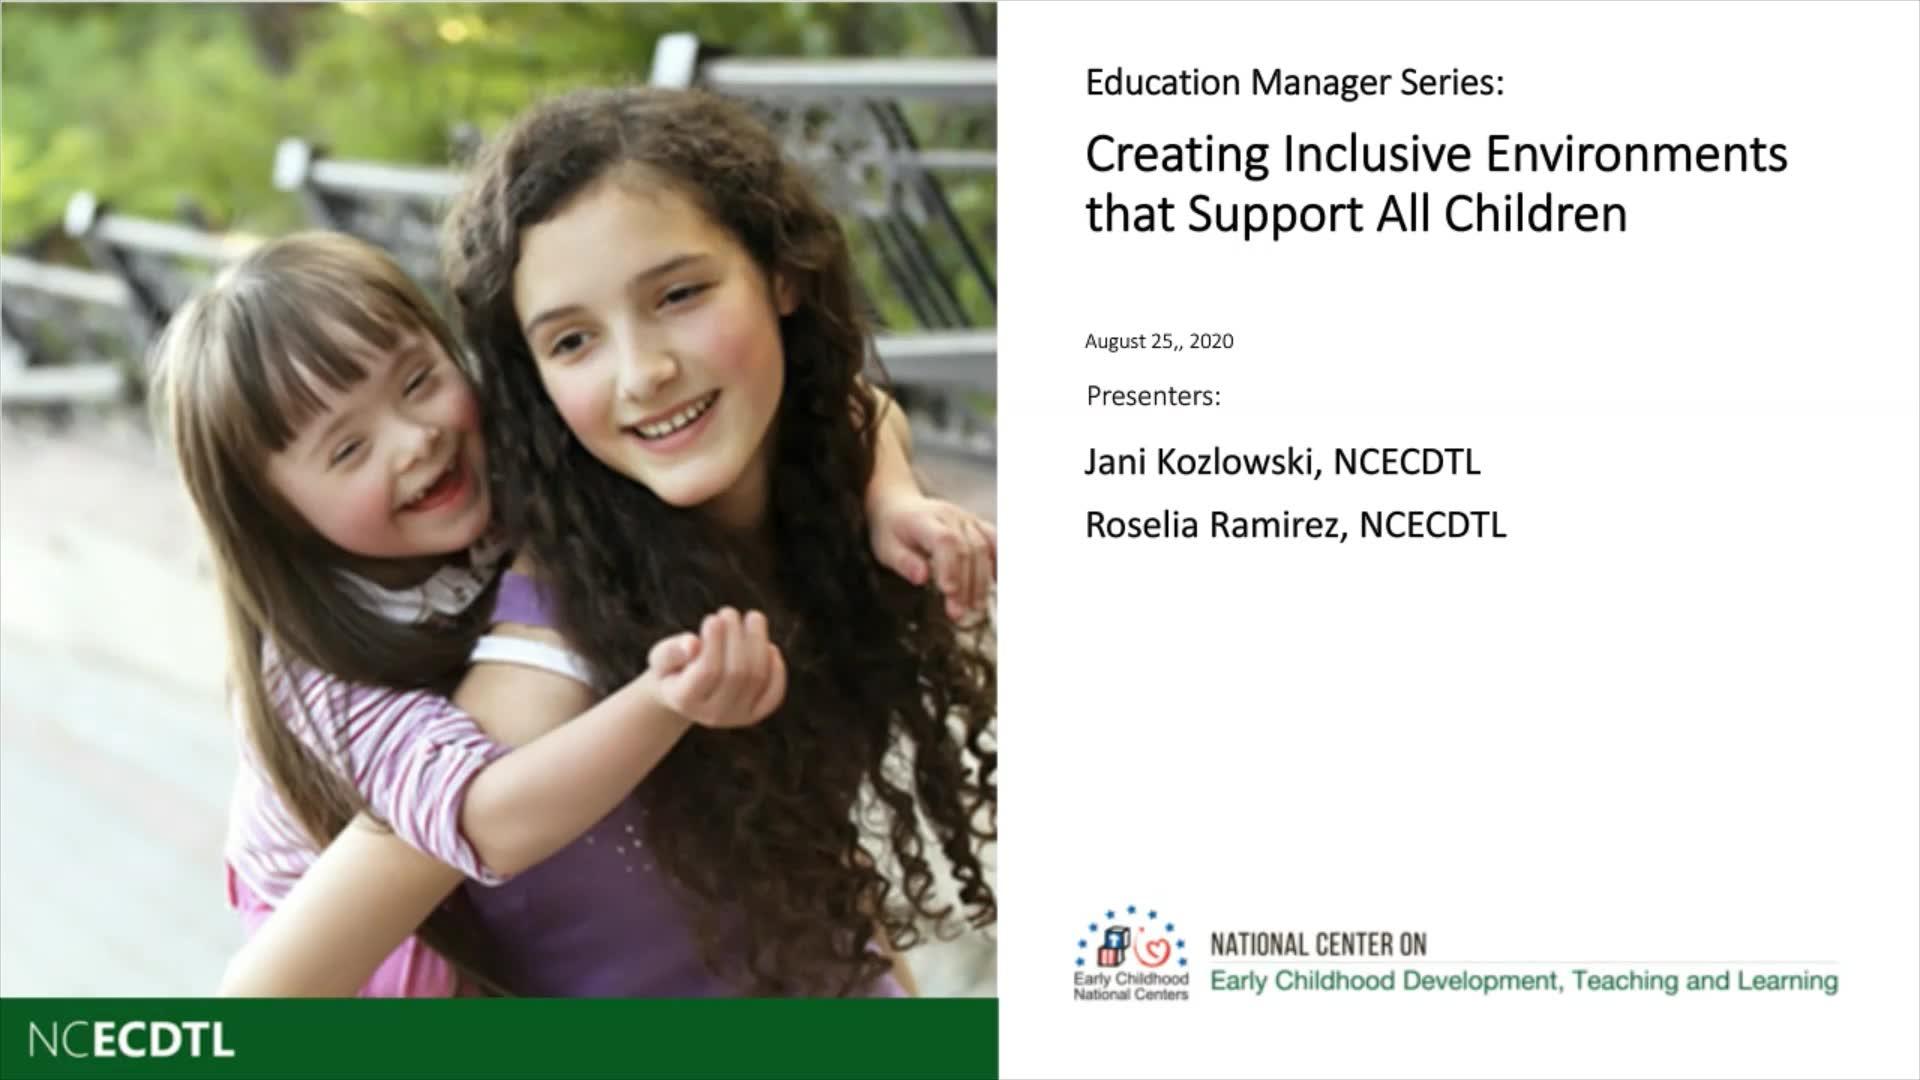 Creación de entornos inclusivos que apoyen a todos los niños